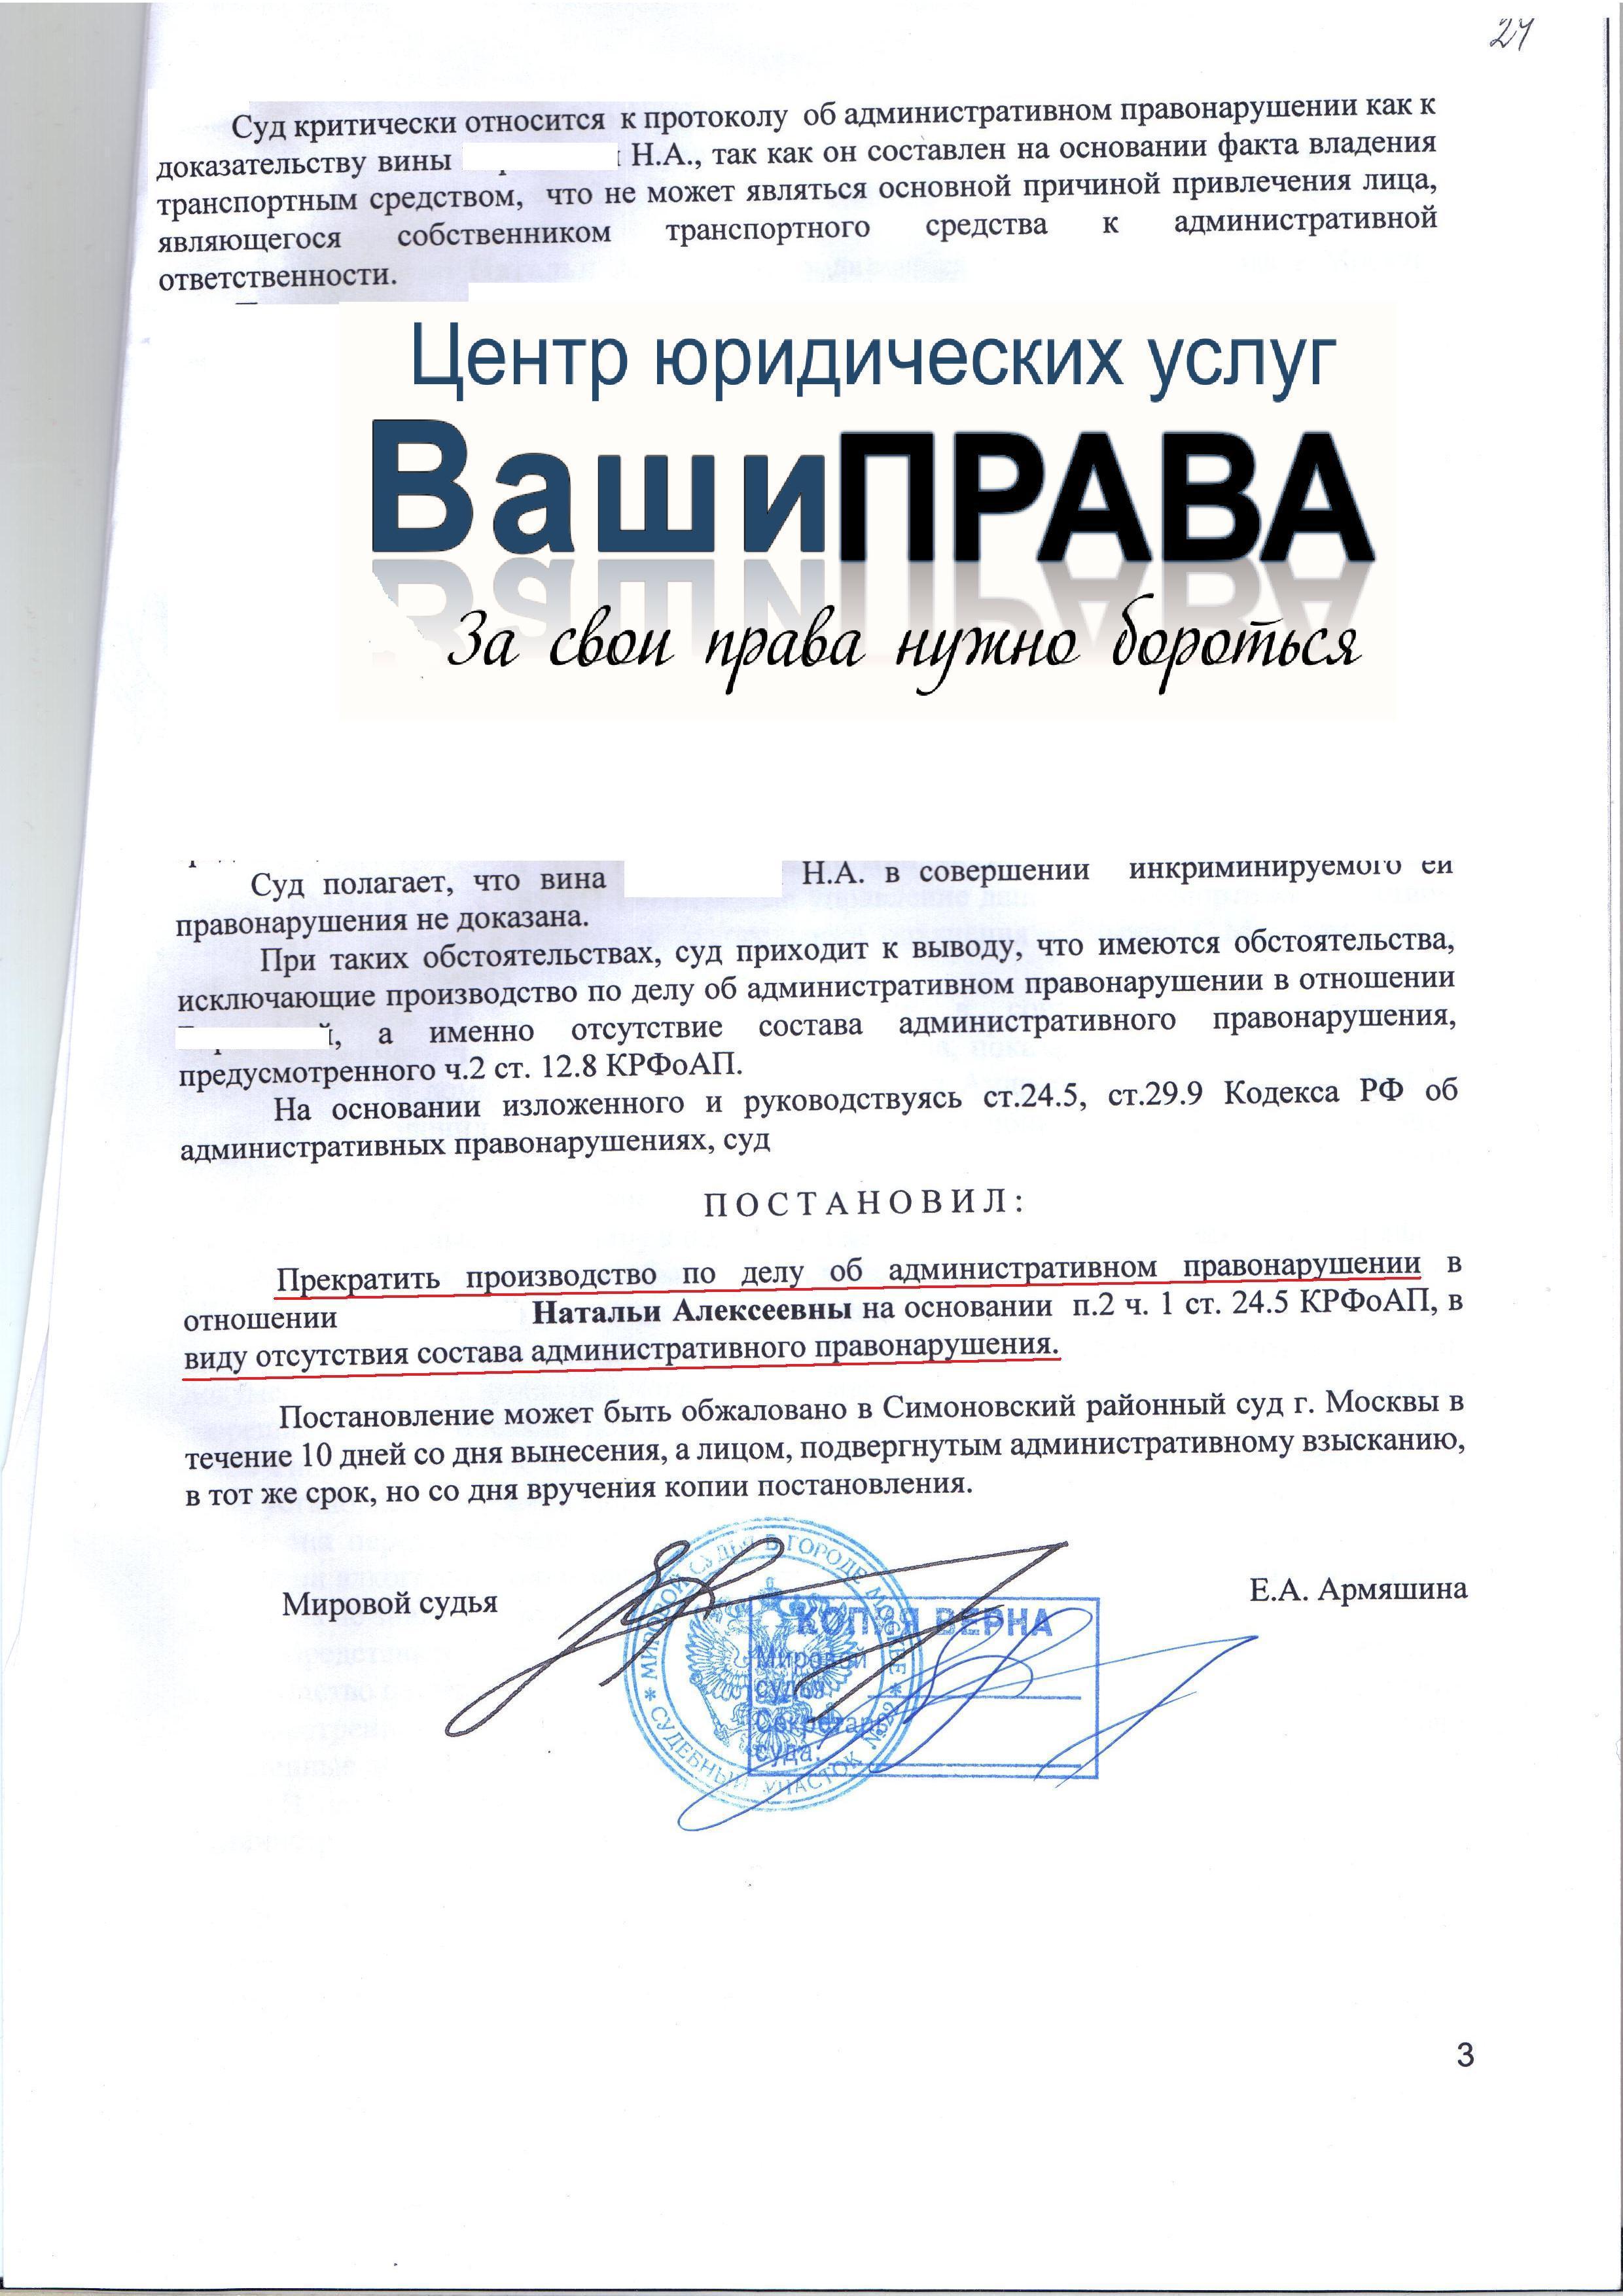 Передача тс лицу в состоянии опьянения - возврат прав, прекращение (ст. 12.8 ч.2 КоАП РФ) Москва, 28 марта 2013 г. (л.3)